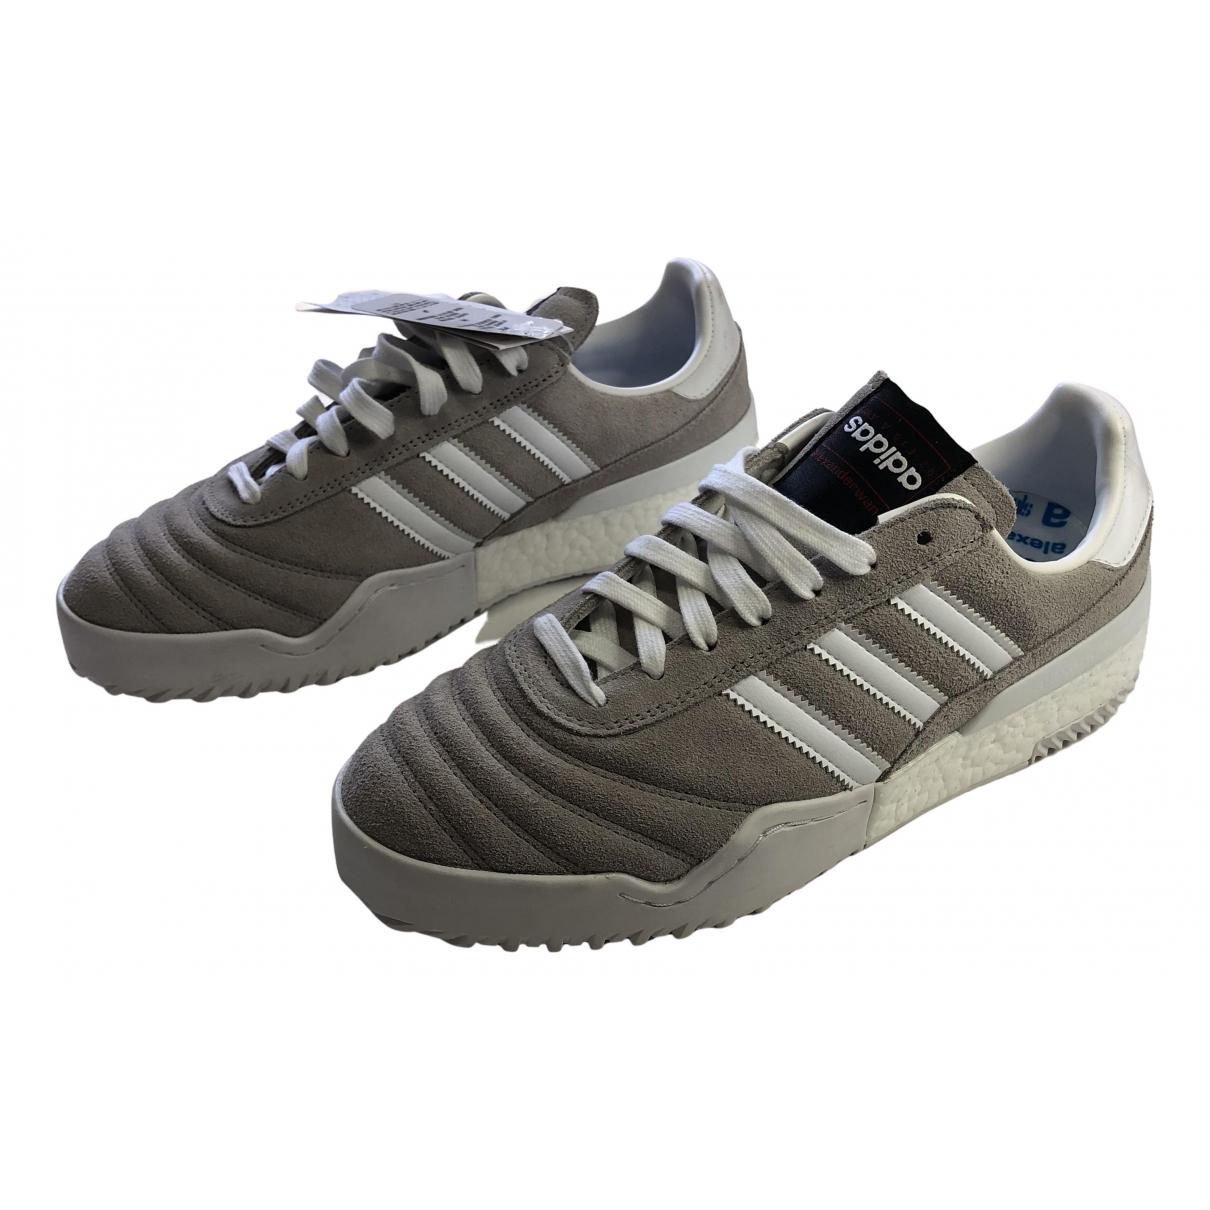 Adidas Originals X Alexander Wang - Baskets   pour homme en cuir - gris